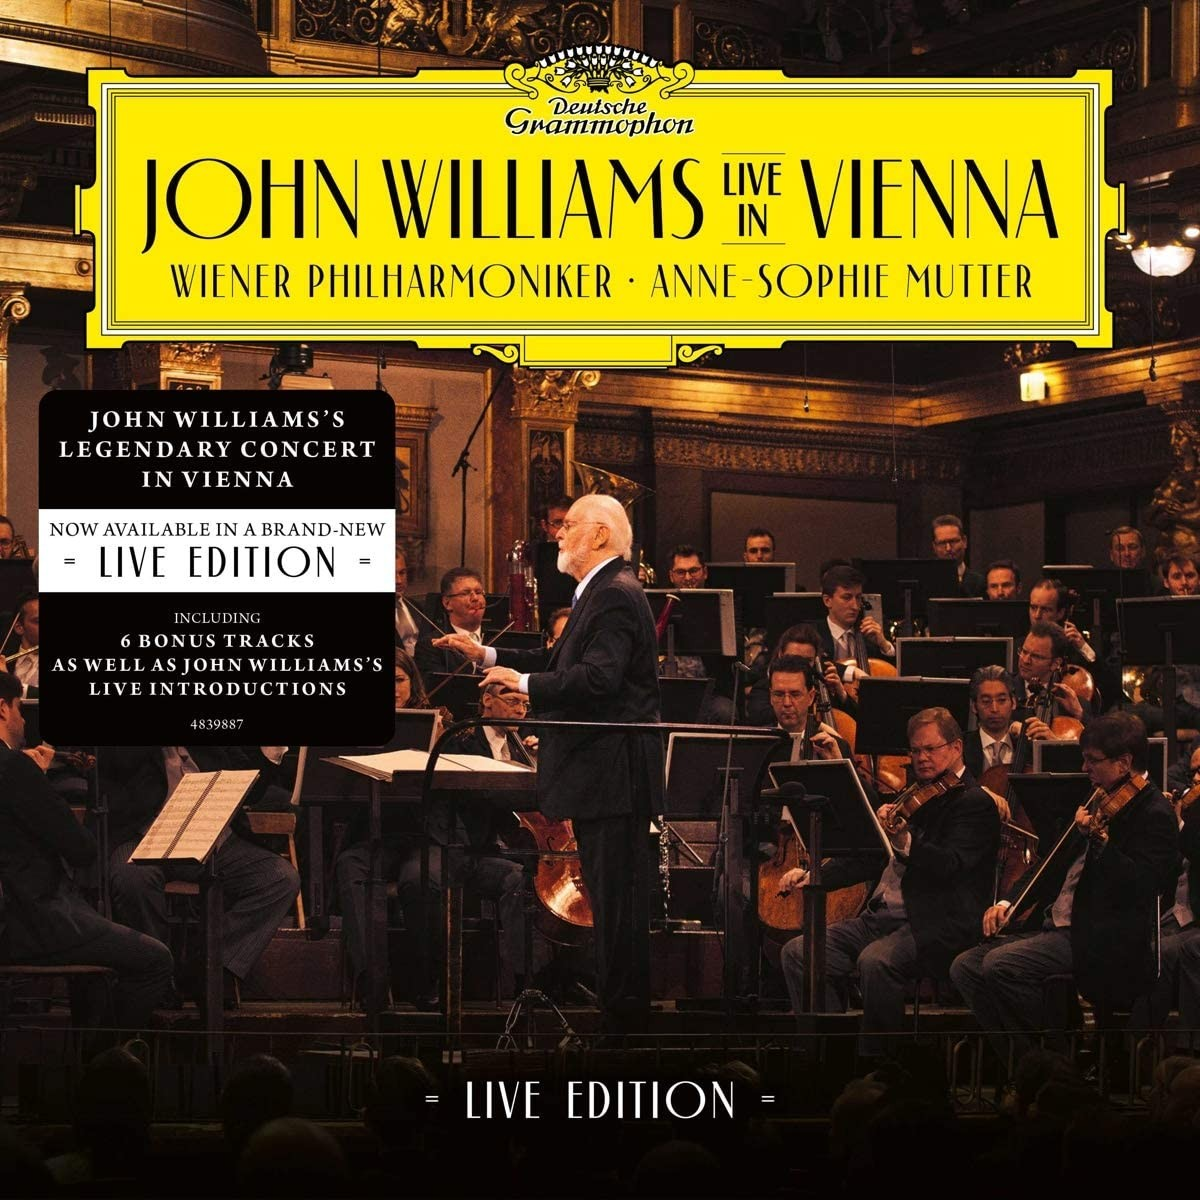 John Williams in Vienna - Live Edition 2CD